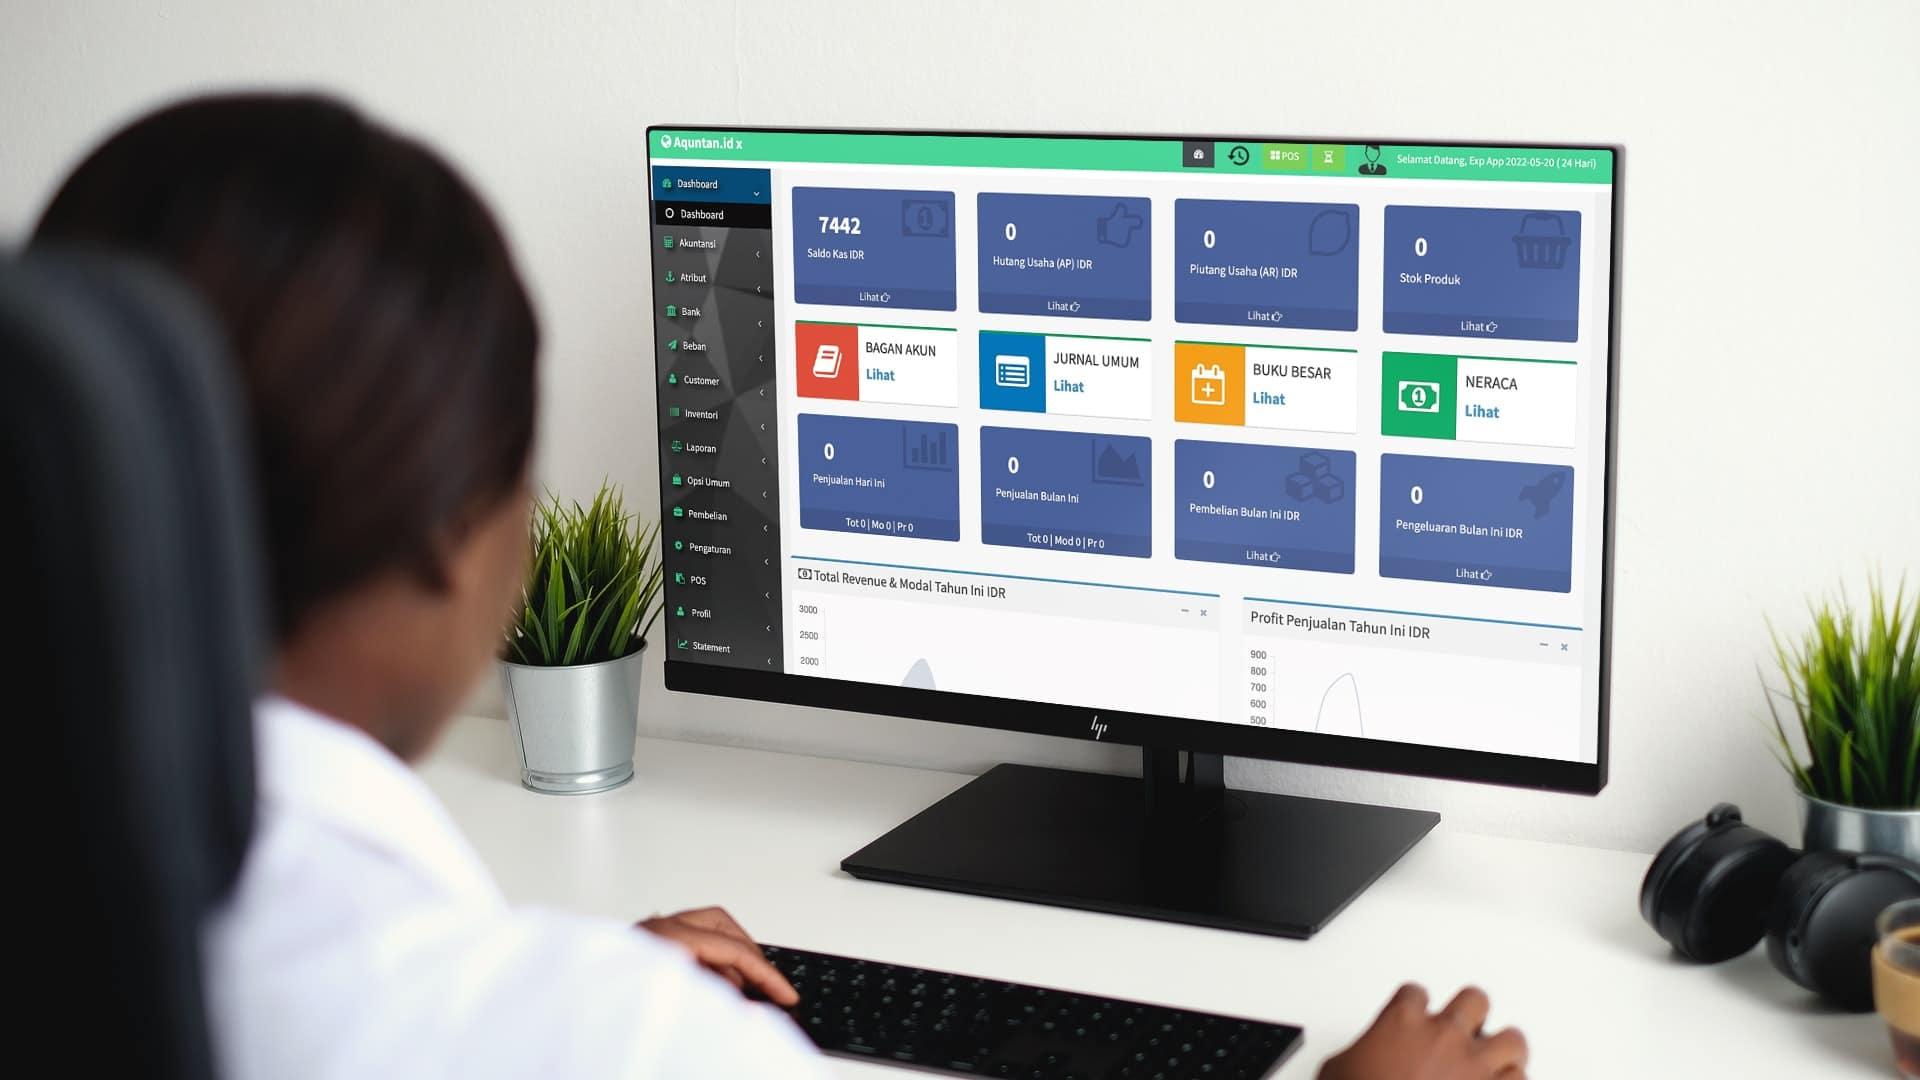 Aplikasi POS, Inventori dan Akuntansi Tanpa Batasan Fitur.